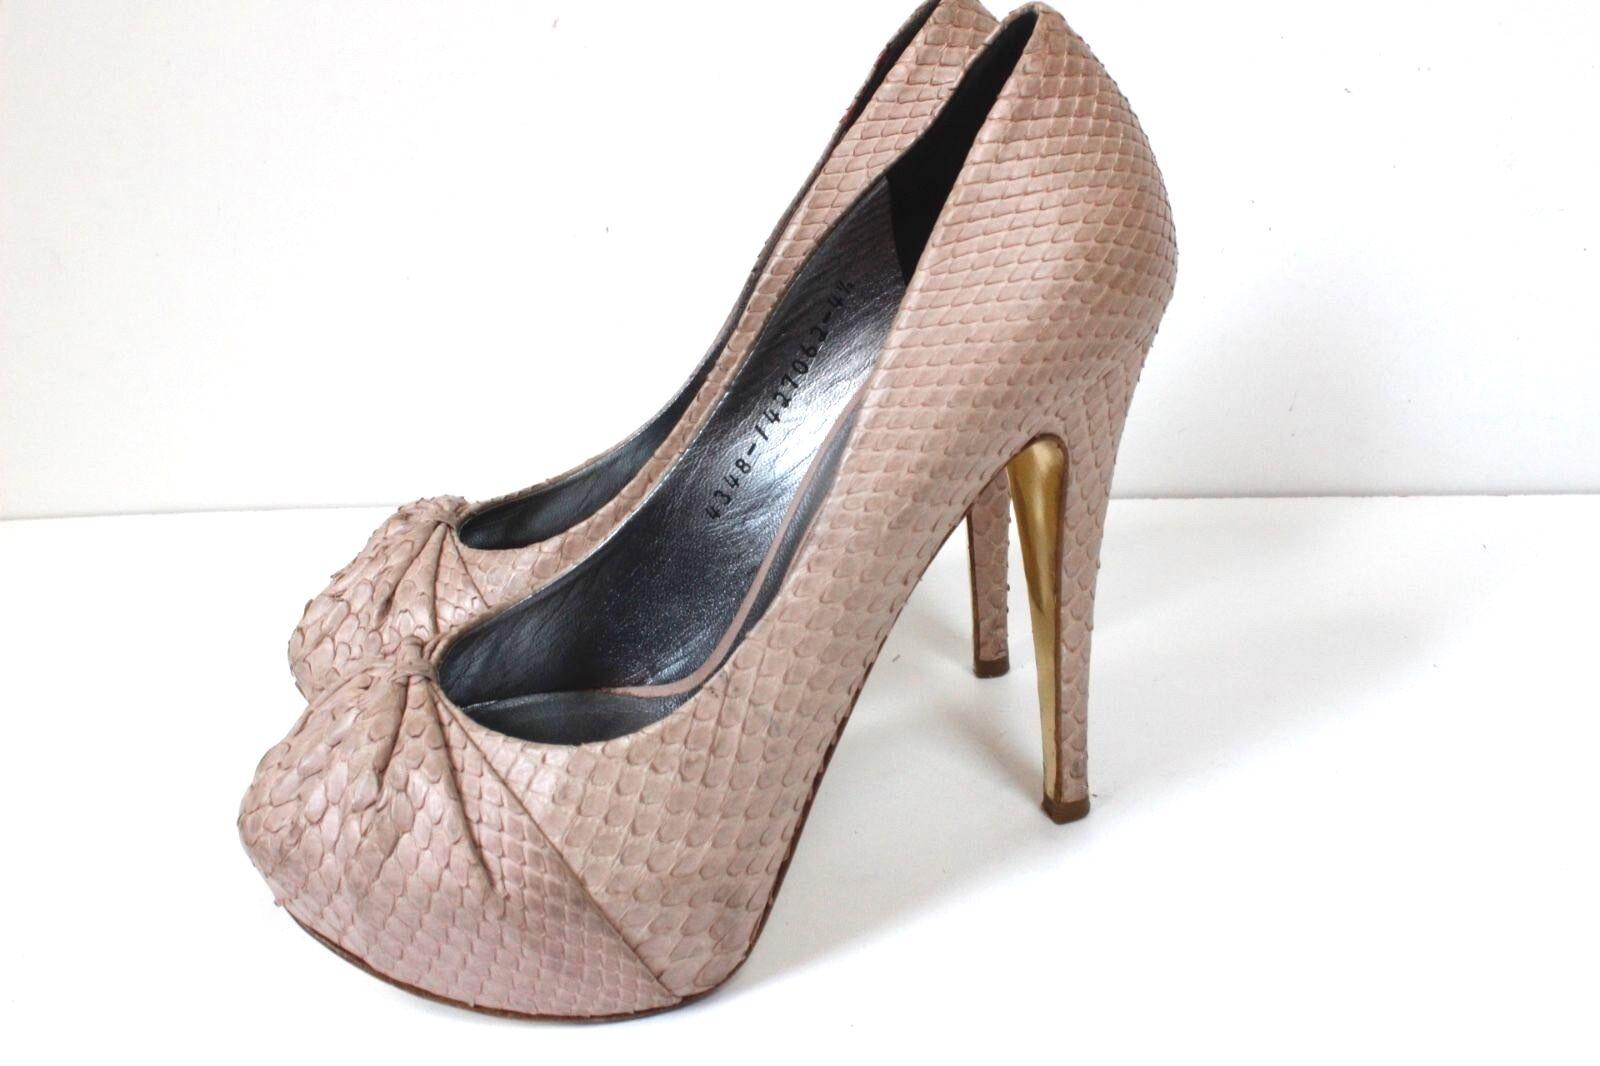 Gina Blaush Rosa Heels Snake Skin Heels Rosa uk 4.5 c74955